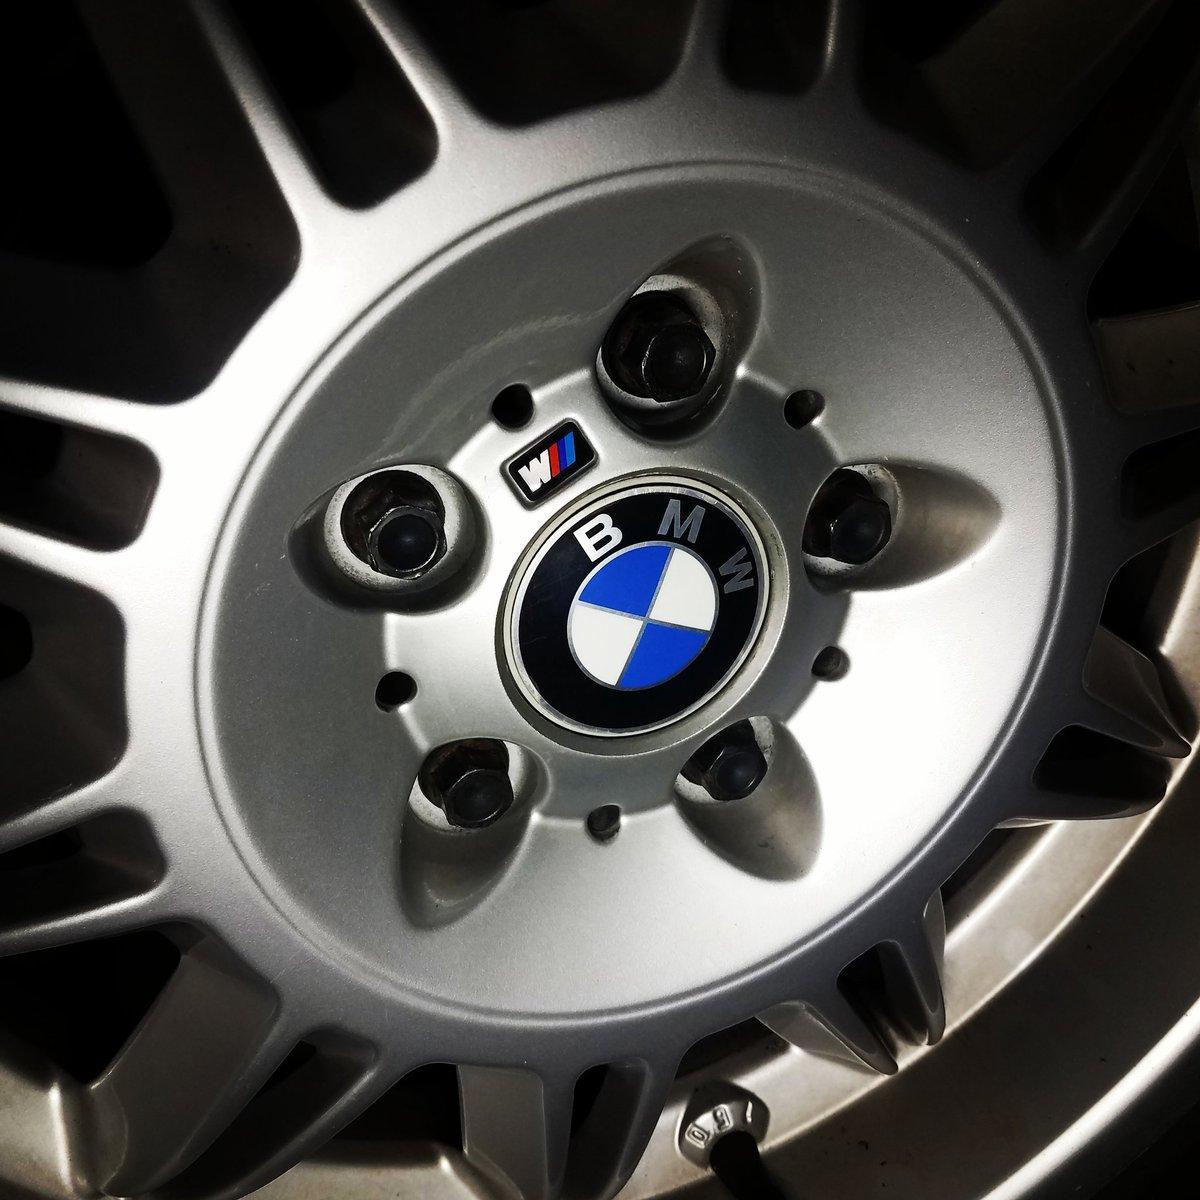 New brakes on the E36 and life is good. ------------------ #RockyMountainFishing #Colorado #BMW #E36 #328i #Sedan #BostonGreen #Manual #Brakes https://t.co/cKG9kH9GTg